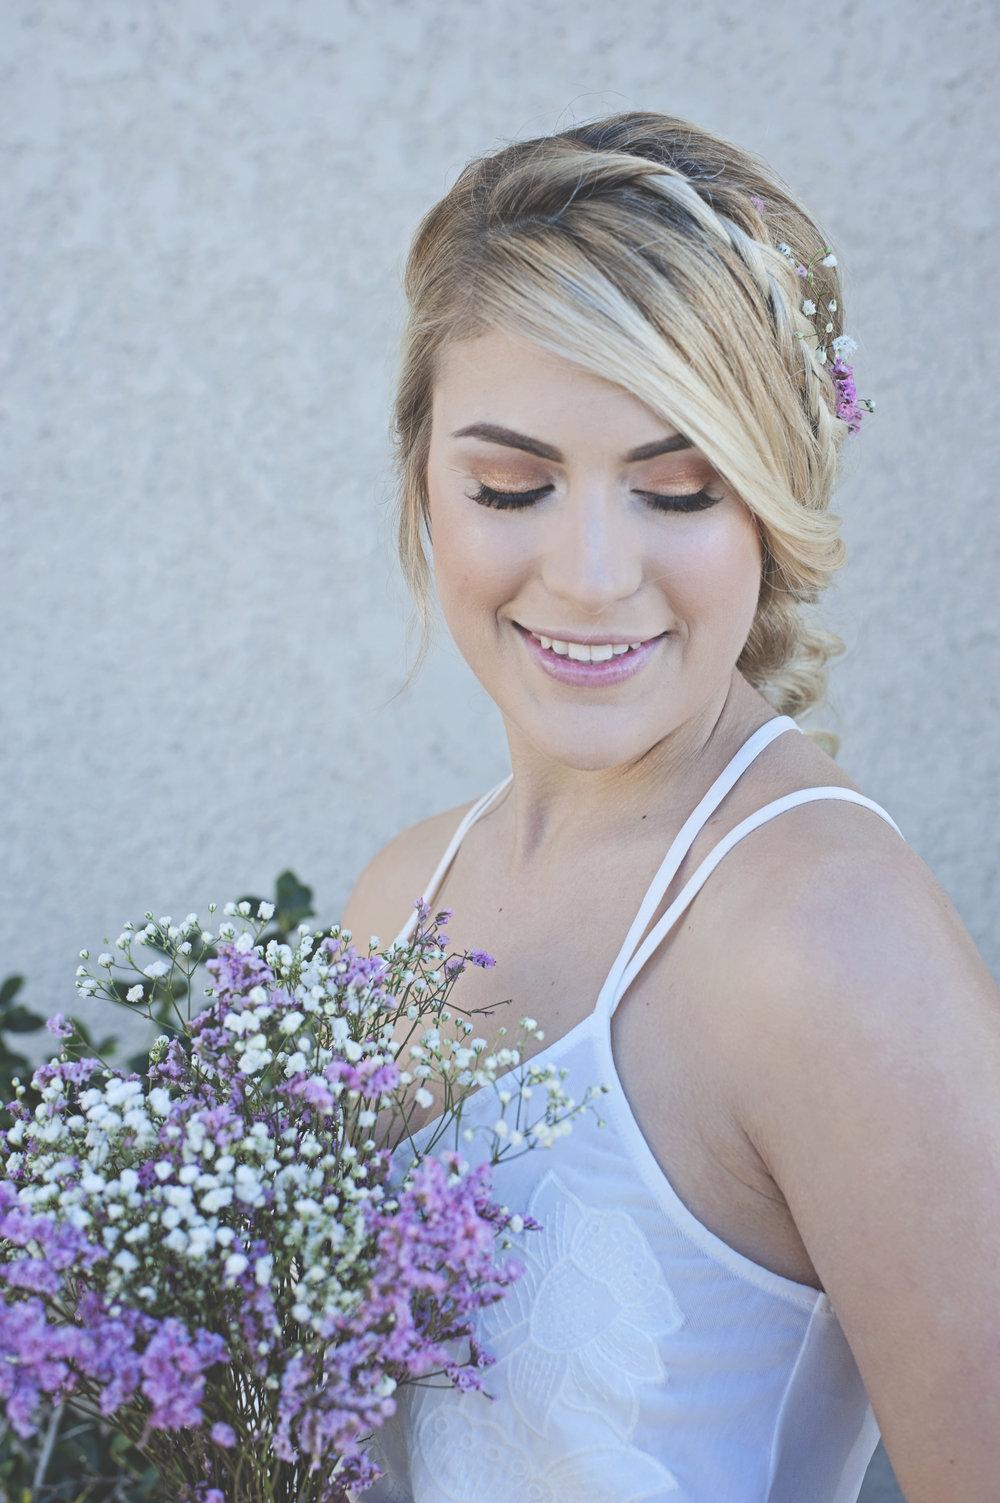 Boho-hair-makeup-bride-dallas-fort-worth-north-texas-032516-2.jpg